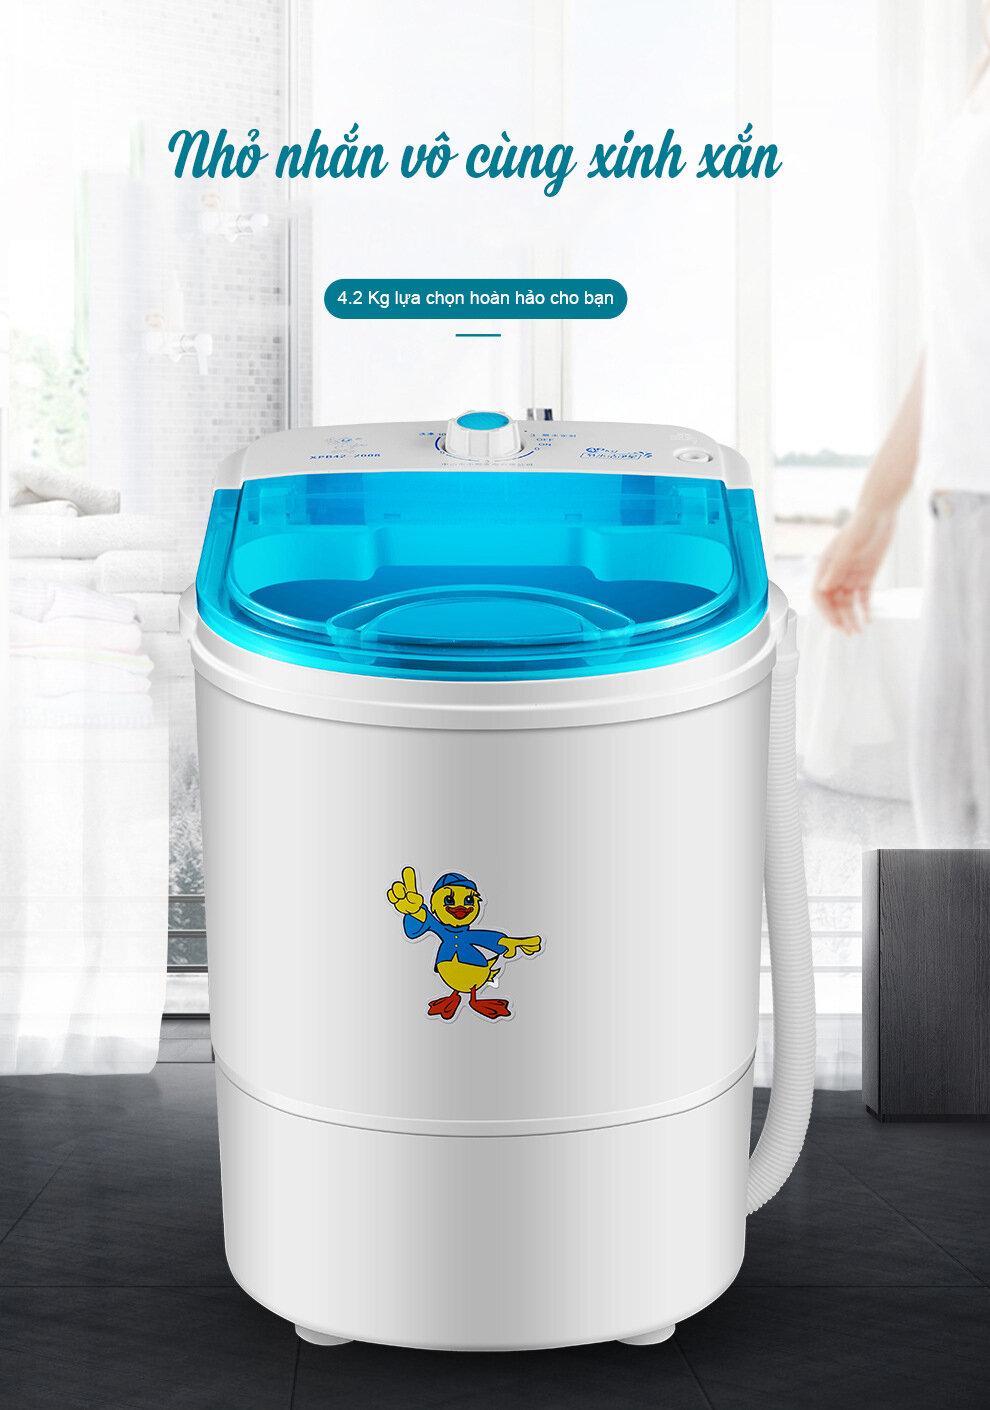 Máy giặt hai lồng mini 4kg